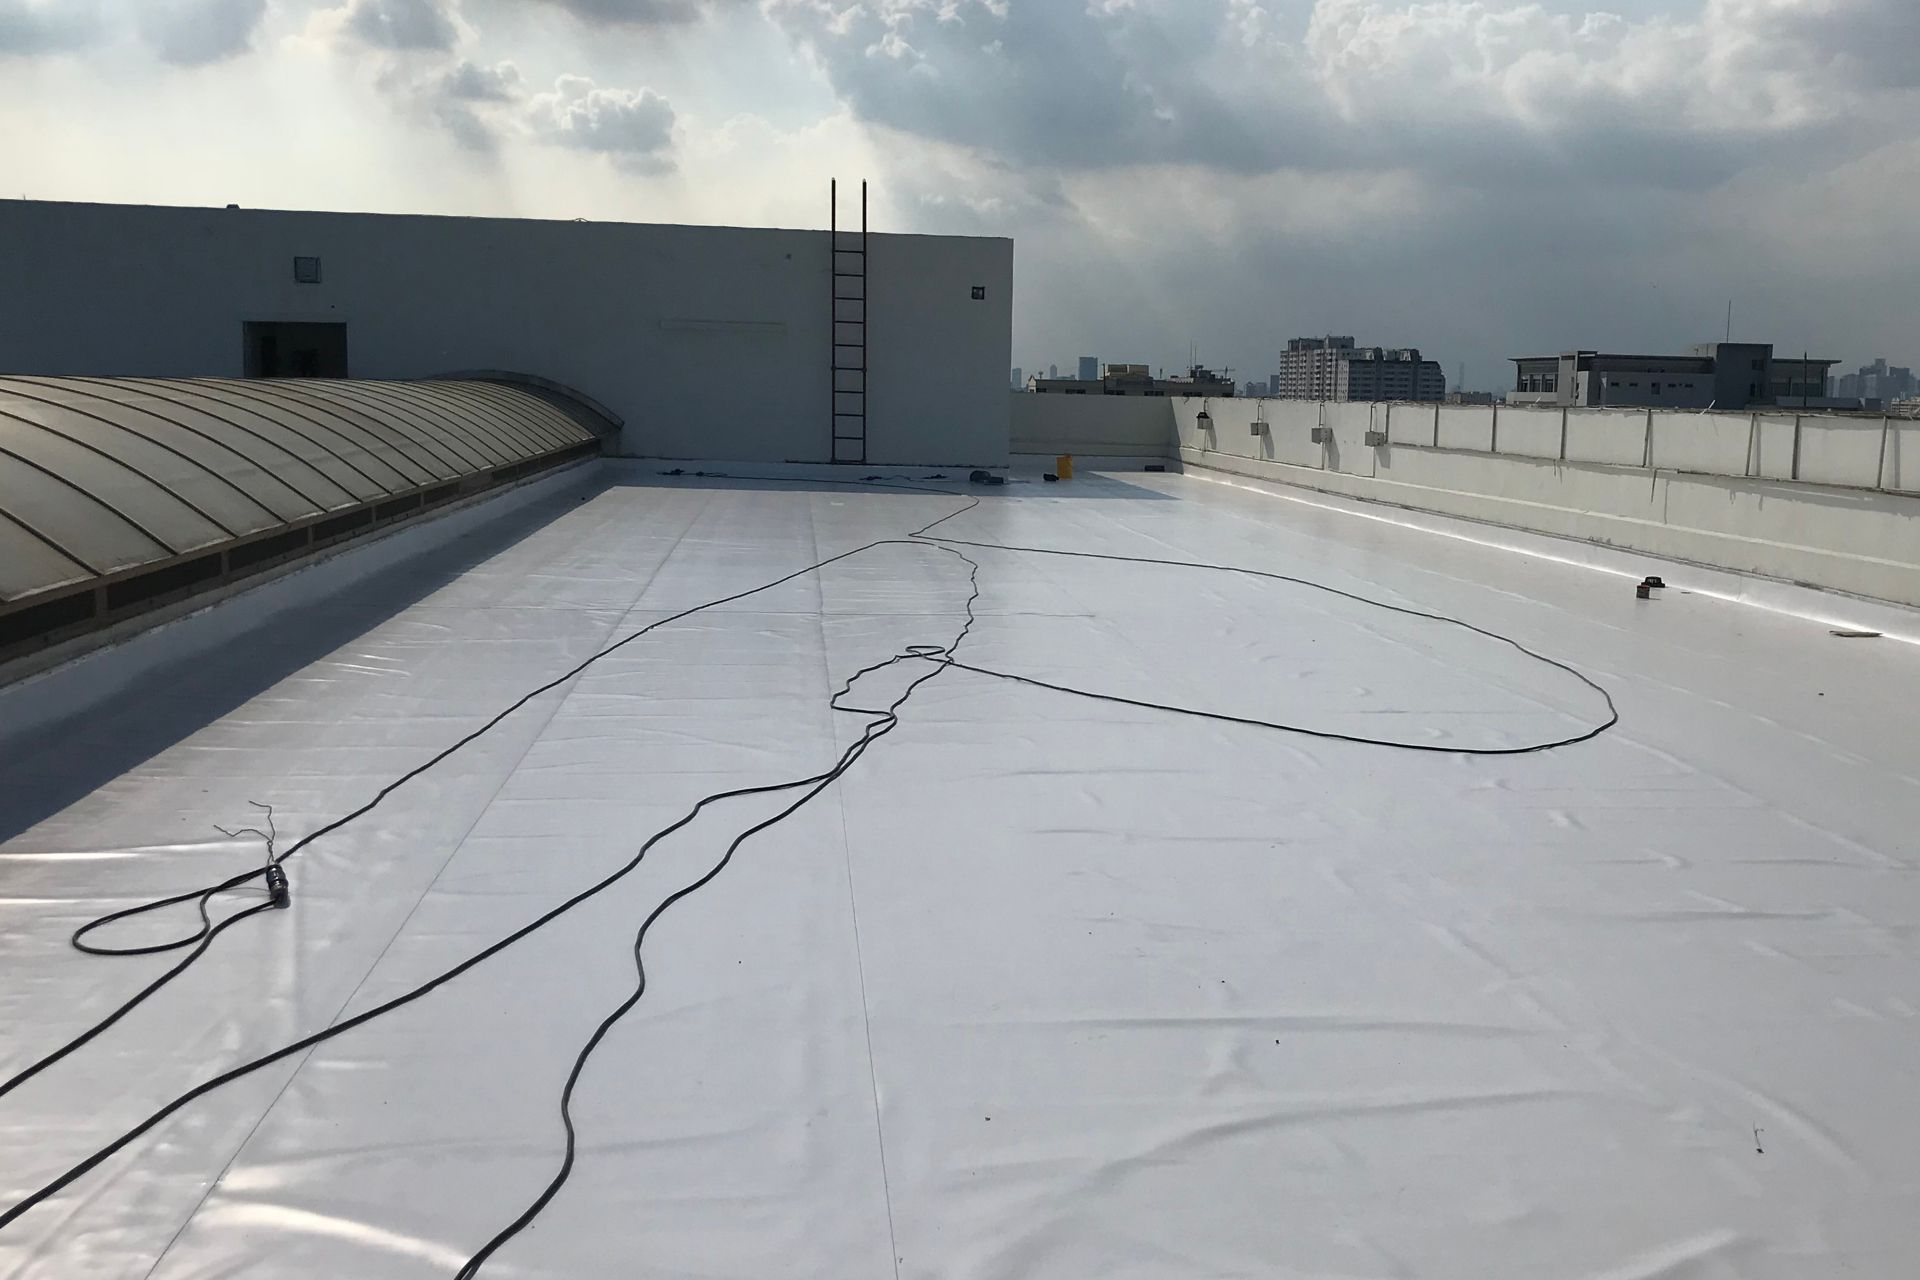 Dusit Thani College Sarnafil Roof